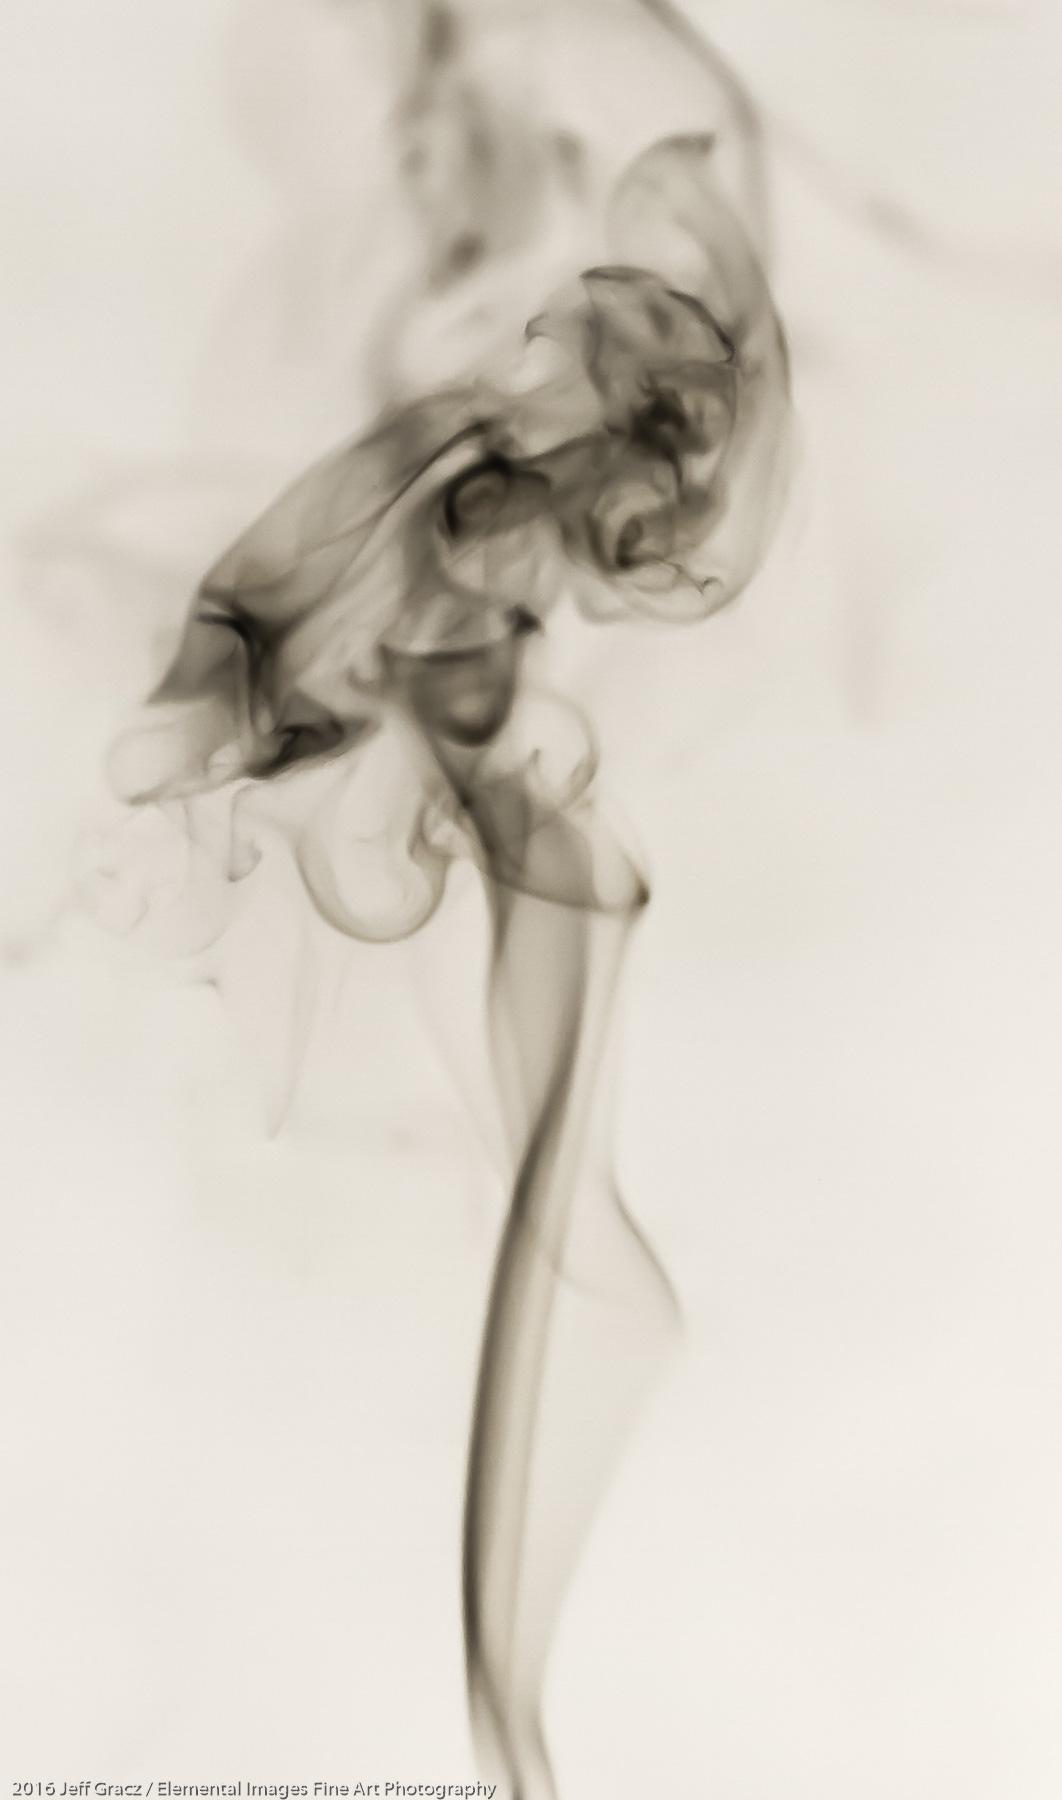 Smoke 19 | Vancouver | WA | USA - © 2016 Jeff Gracz / Elemental Images Fine Art Photography - All Rights Reserved Worldwide